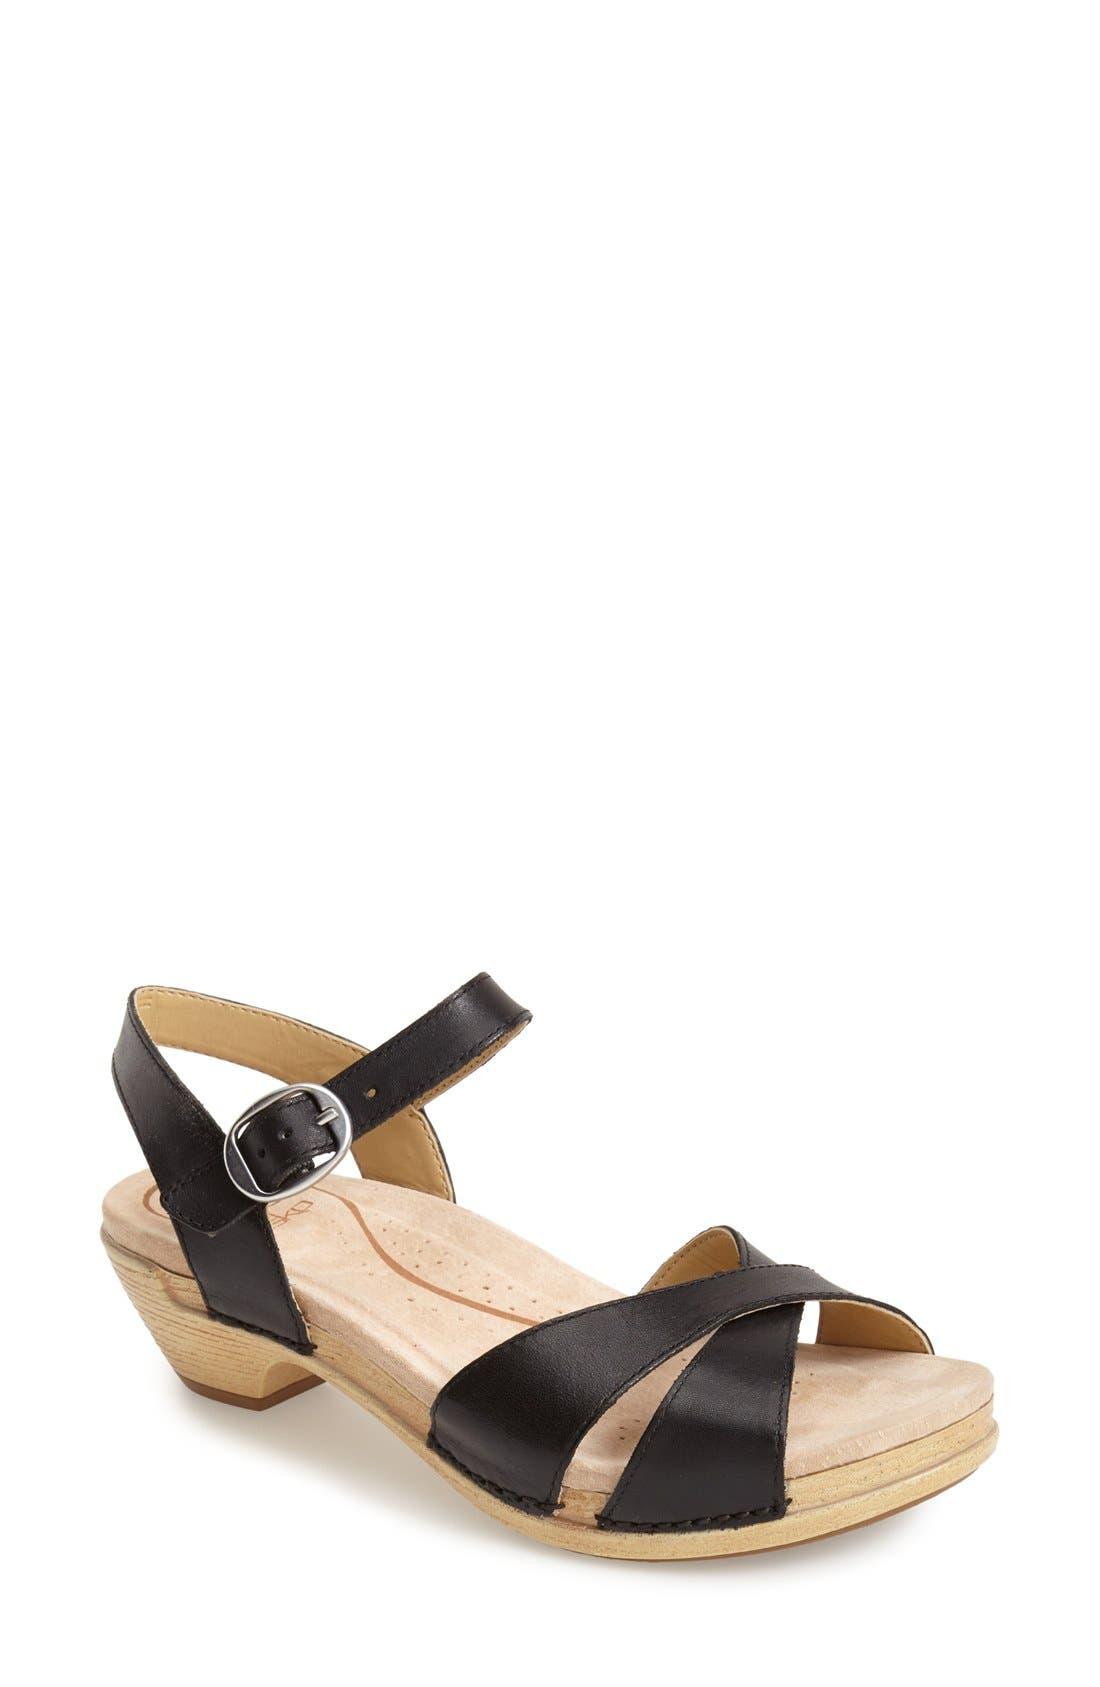 'Larissa' Sandal,                         Main,                         color, 001